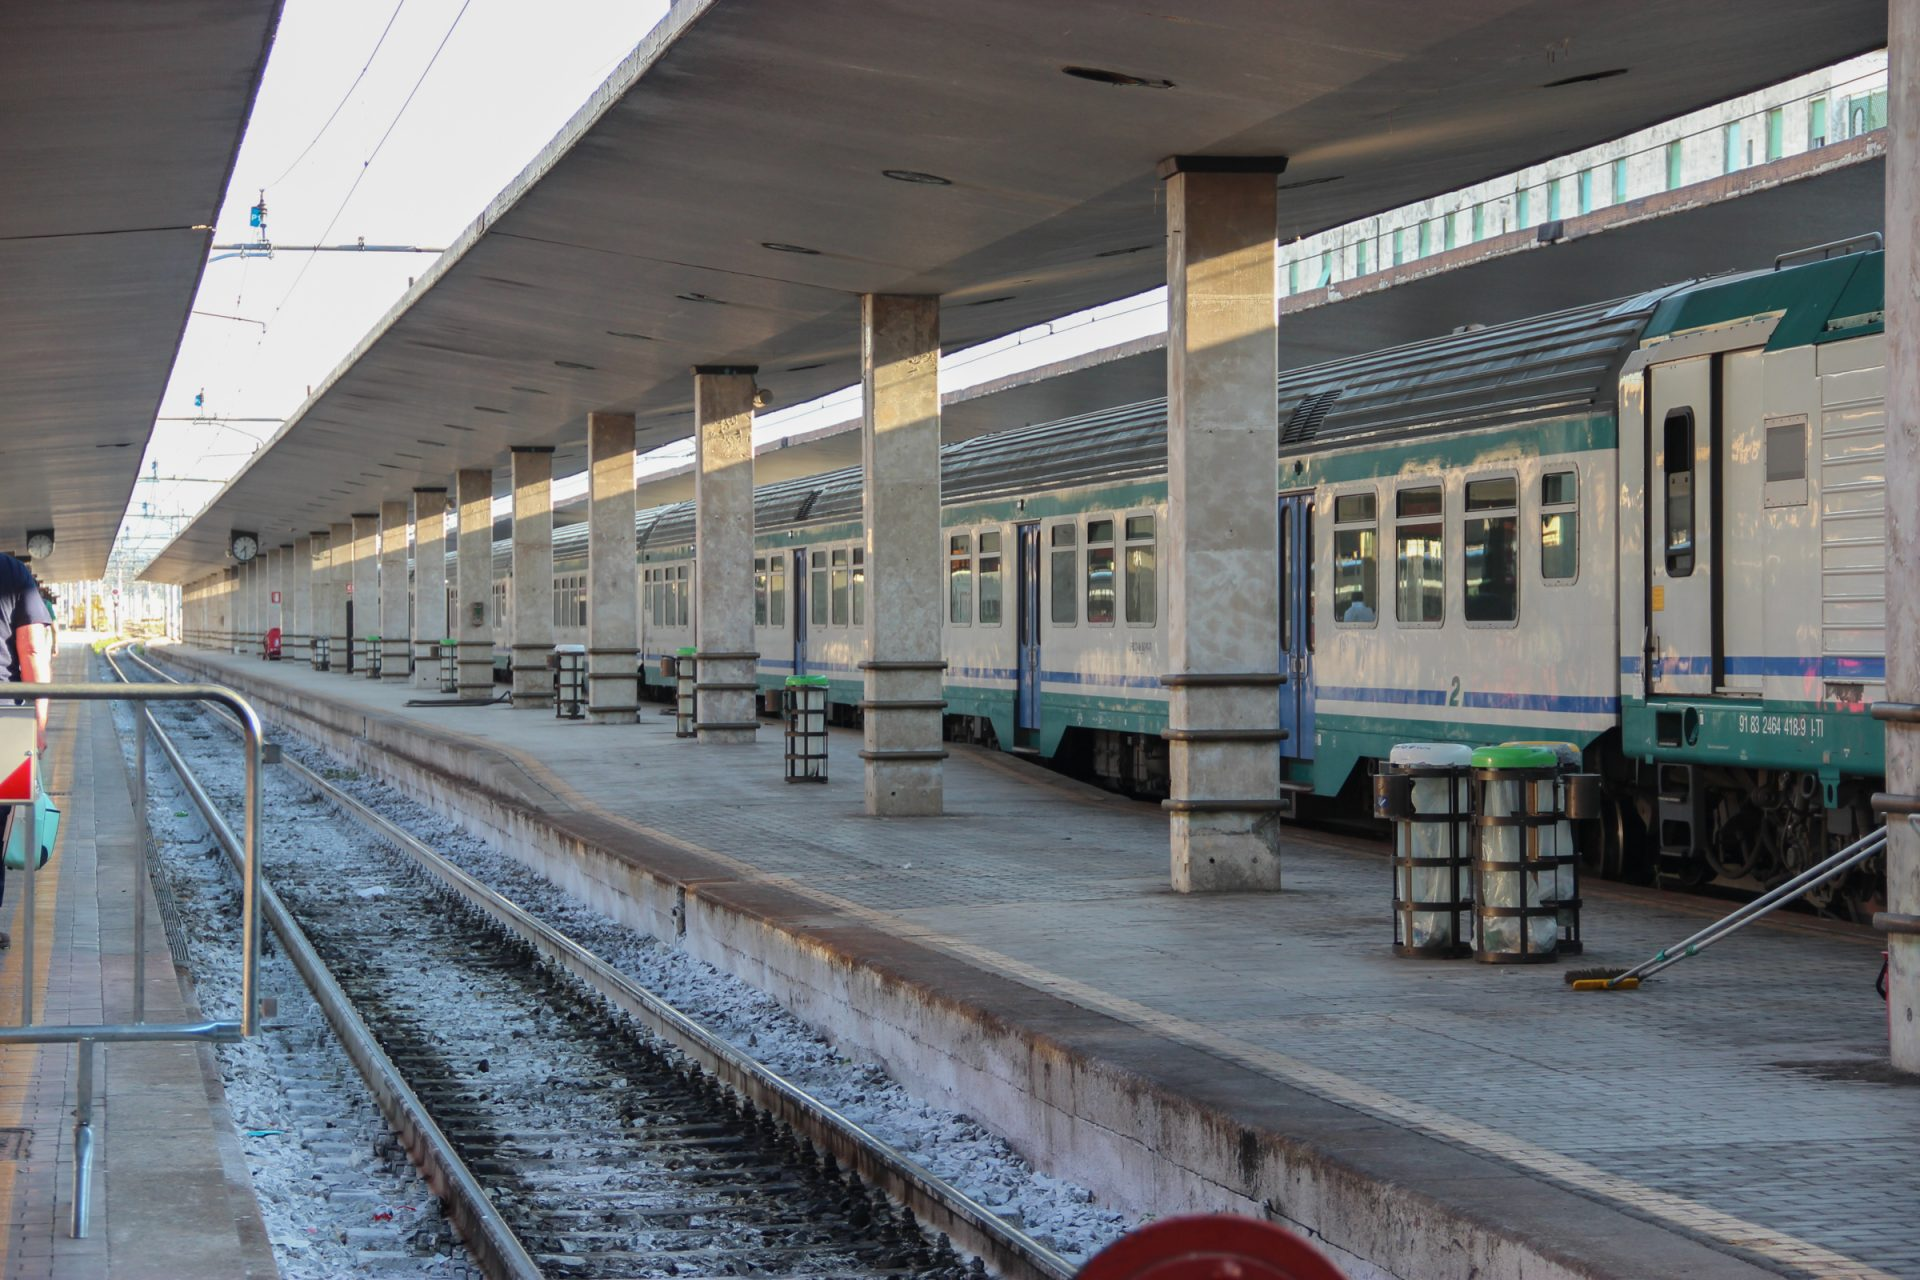 Train & Tracks at Sation